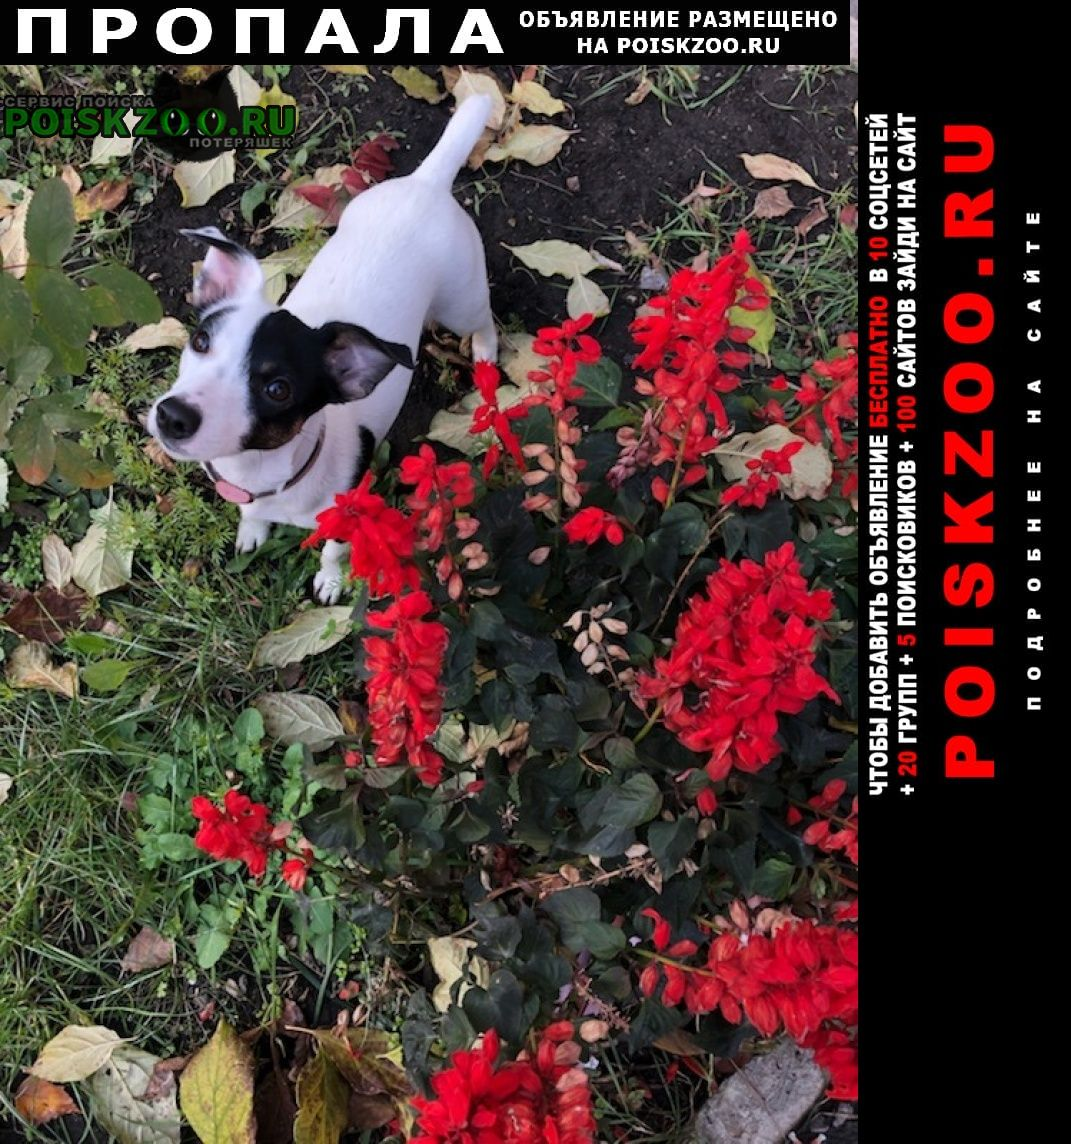 Пропала собака потерялась Барнаул